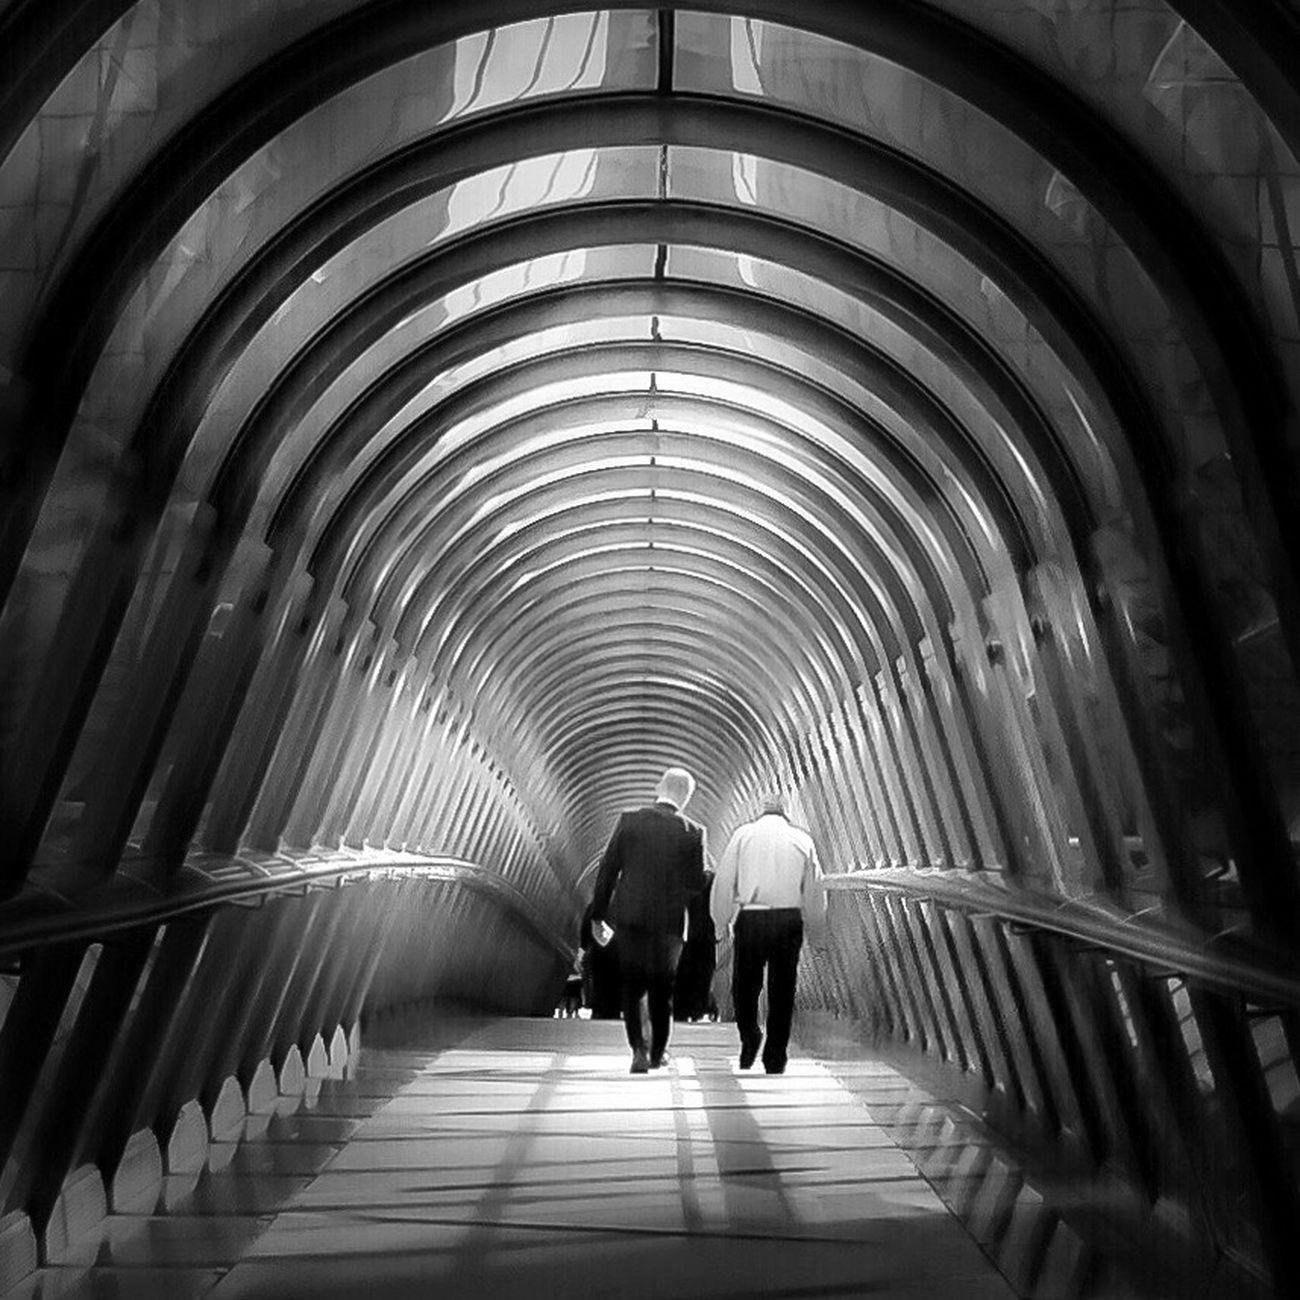 Japs bridge Blackandwhite Black And White Shootermag Paris AMPt - Vanishing Point Architecture Bridge